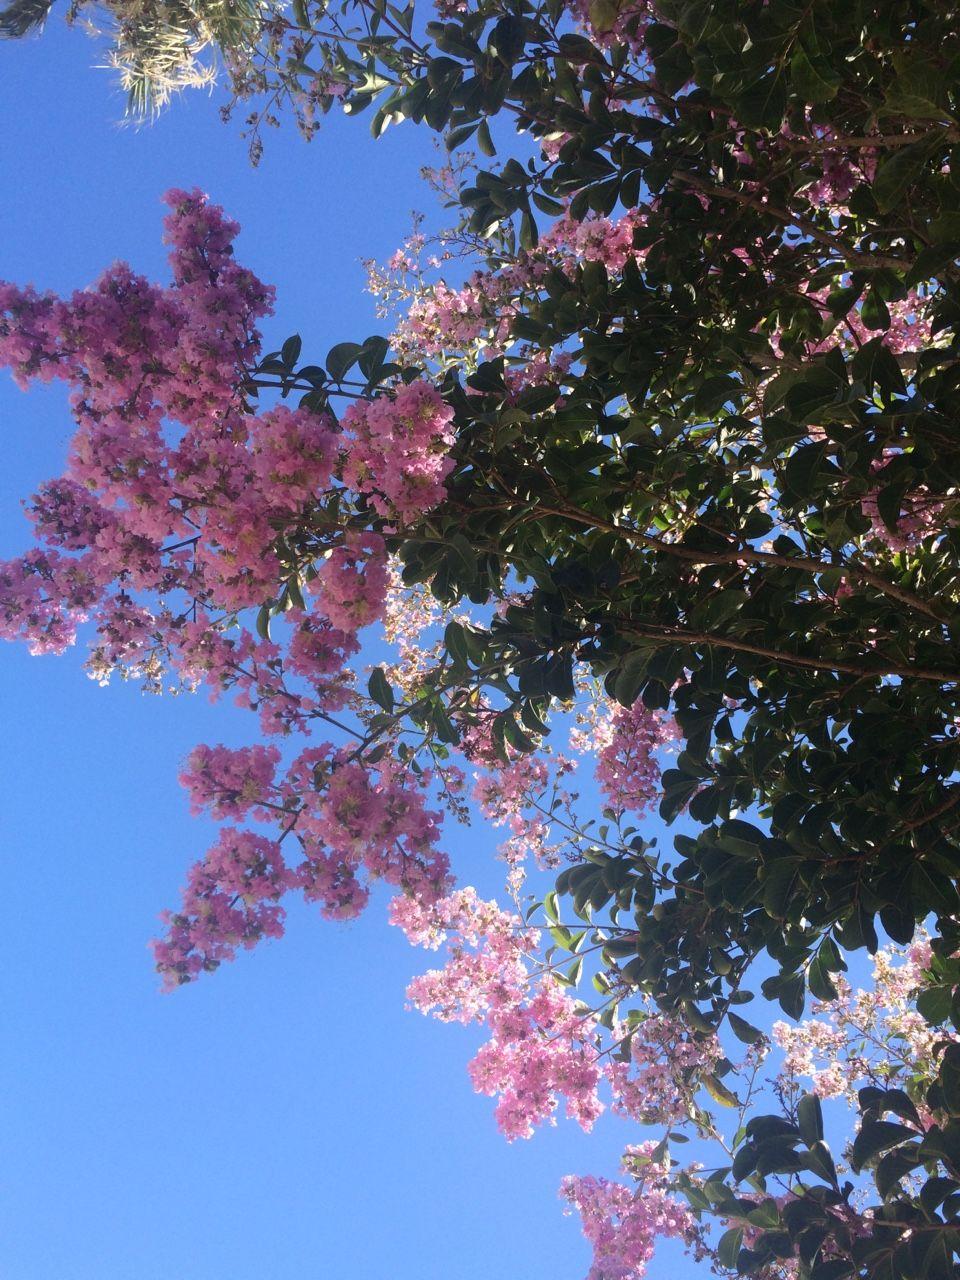 Pin by Sydney Nadal on botanical Flower aesthetic